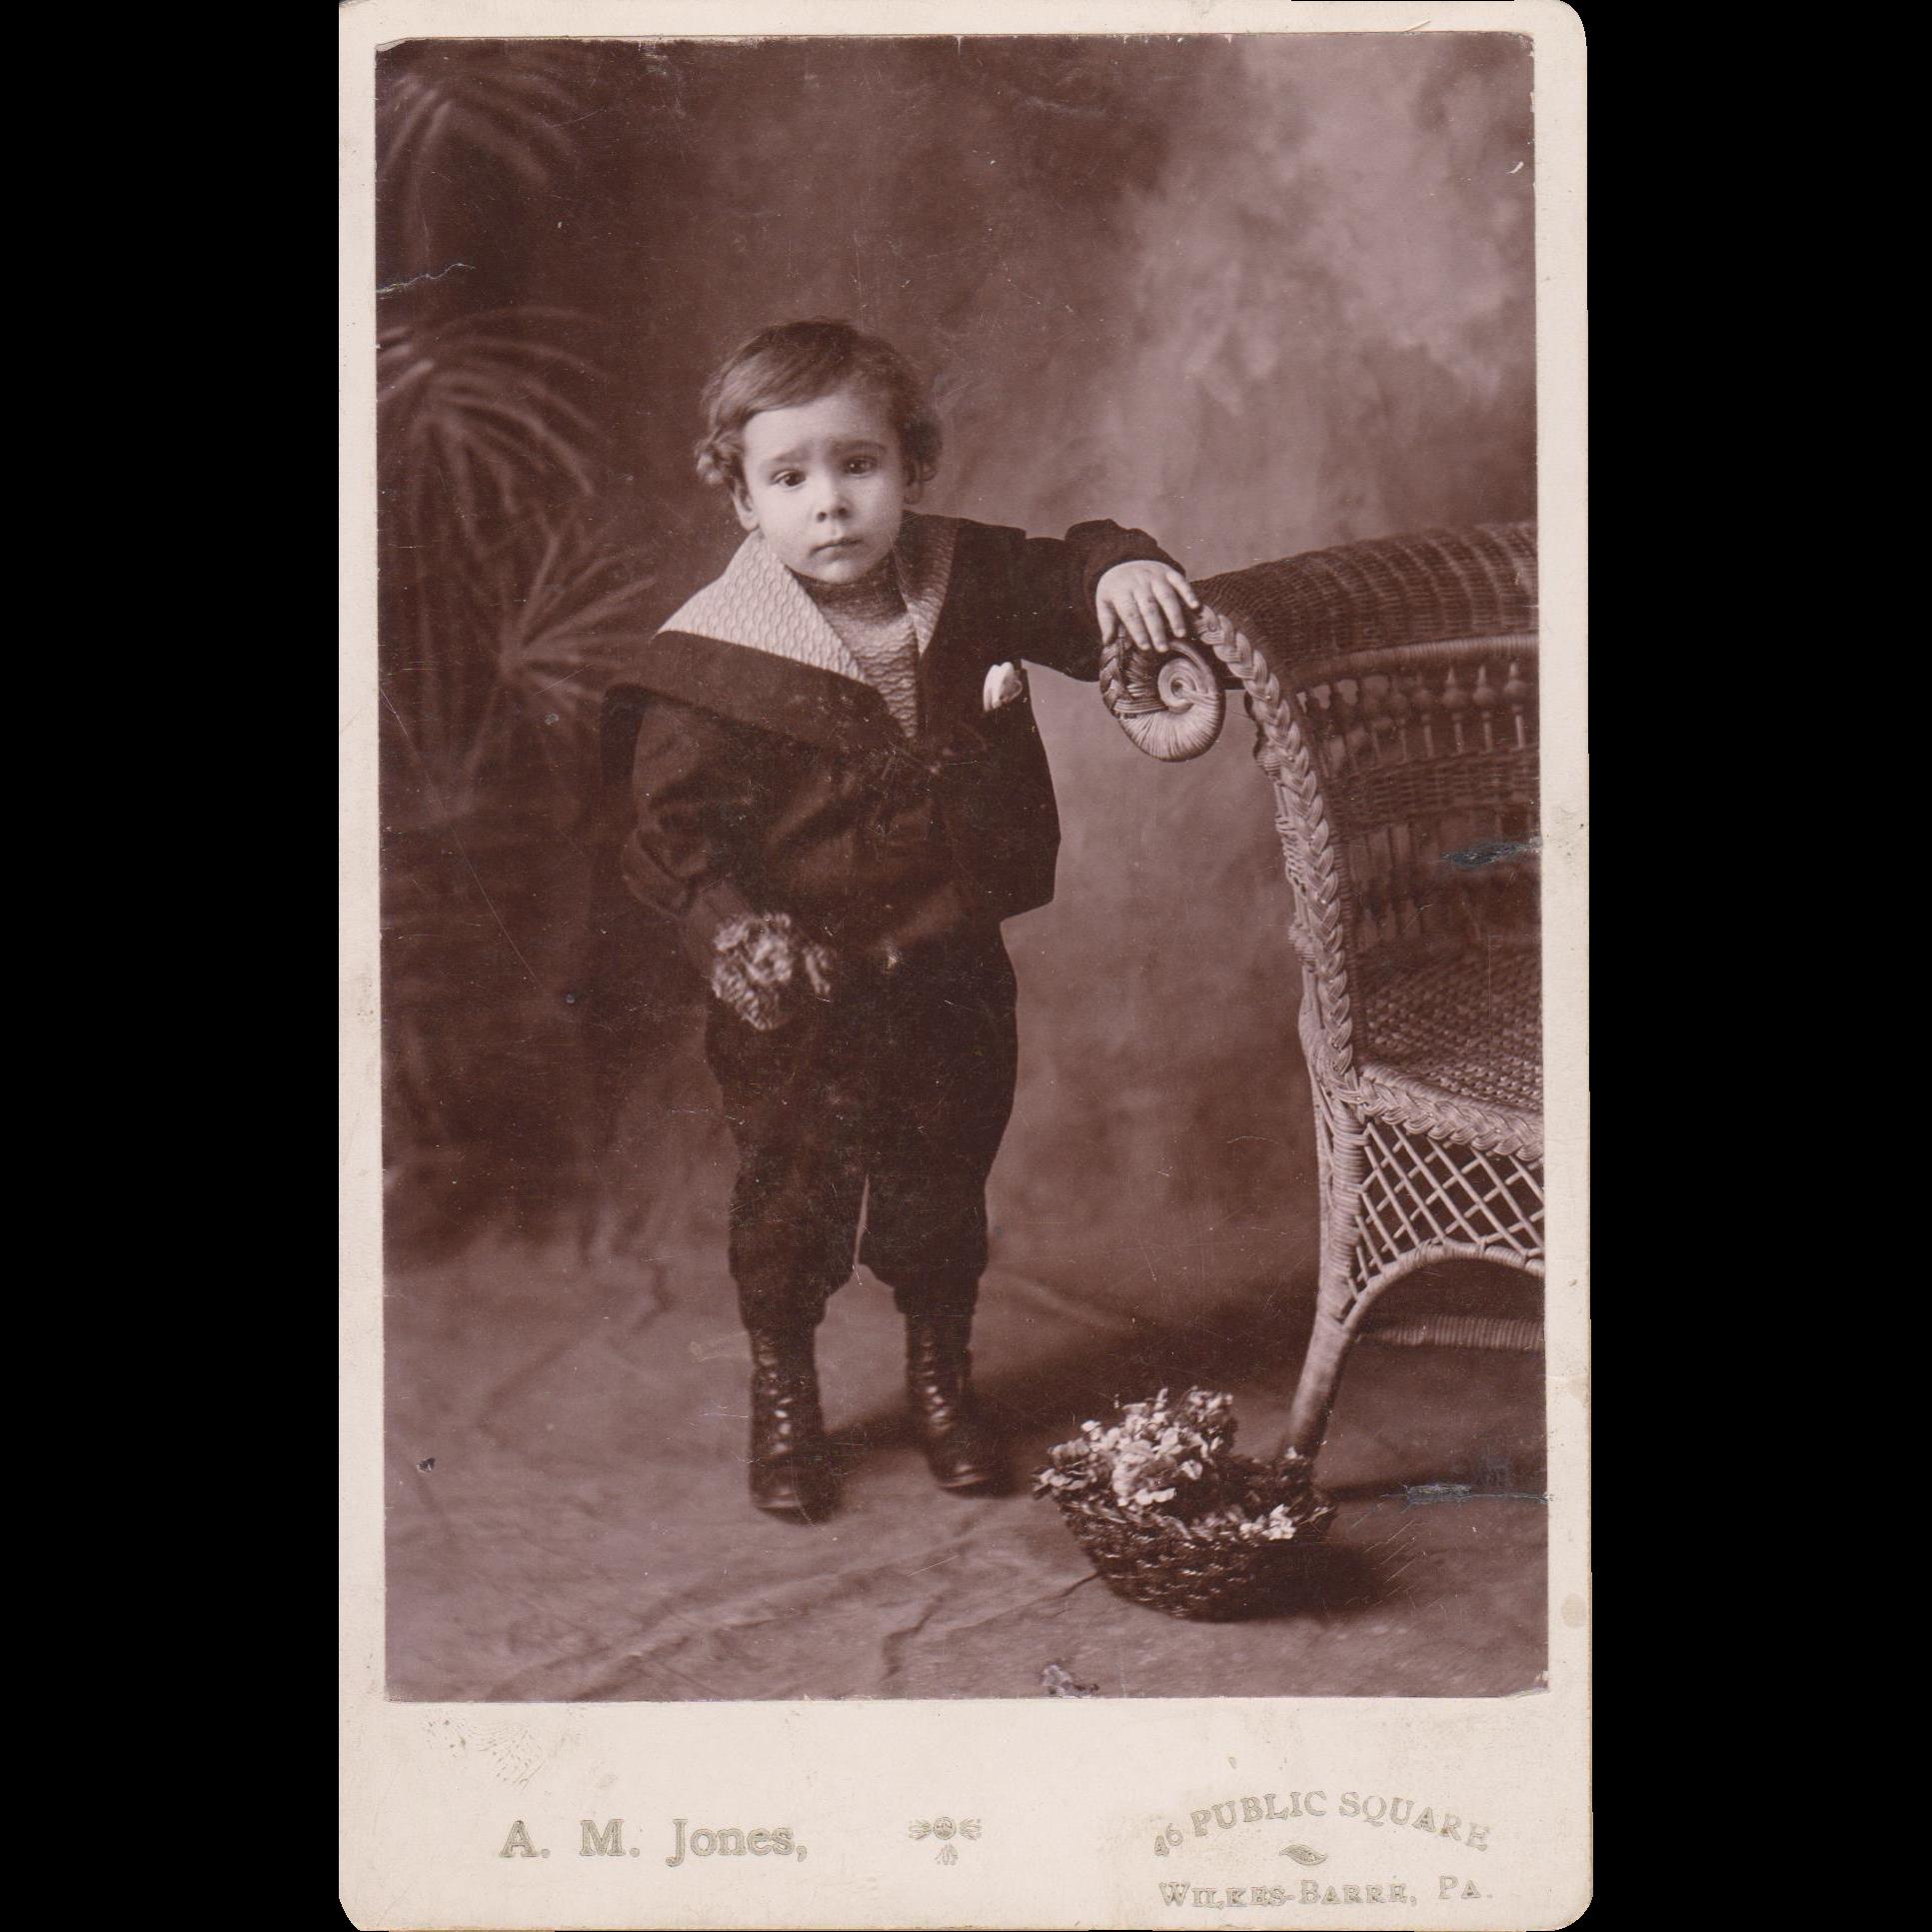 "ORIGINAL LITTLE BOY PHOTO - Vintage - Black & White - 6 1/2""- x 4 1/4"" - Dark Coloring!!"